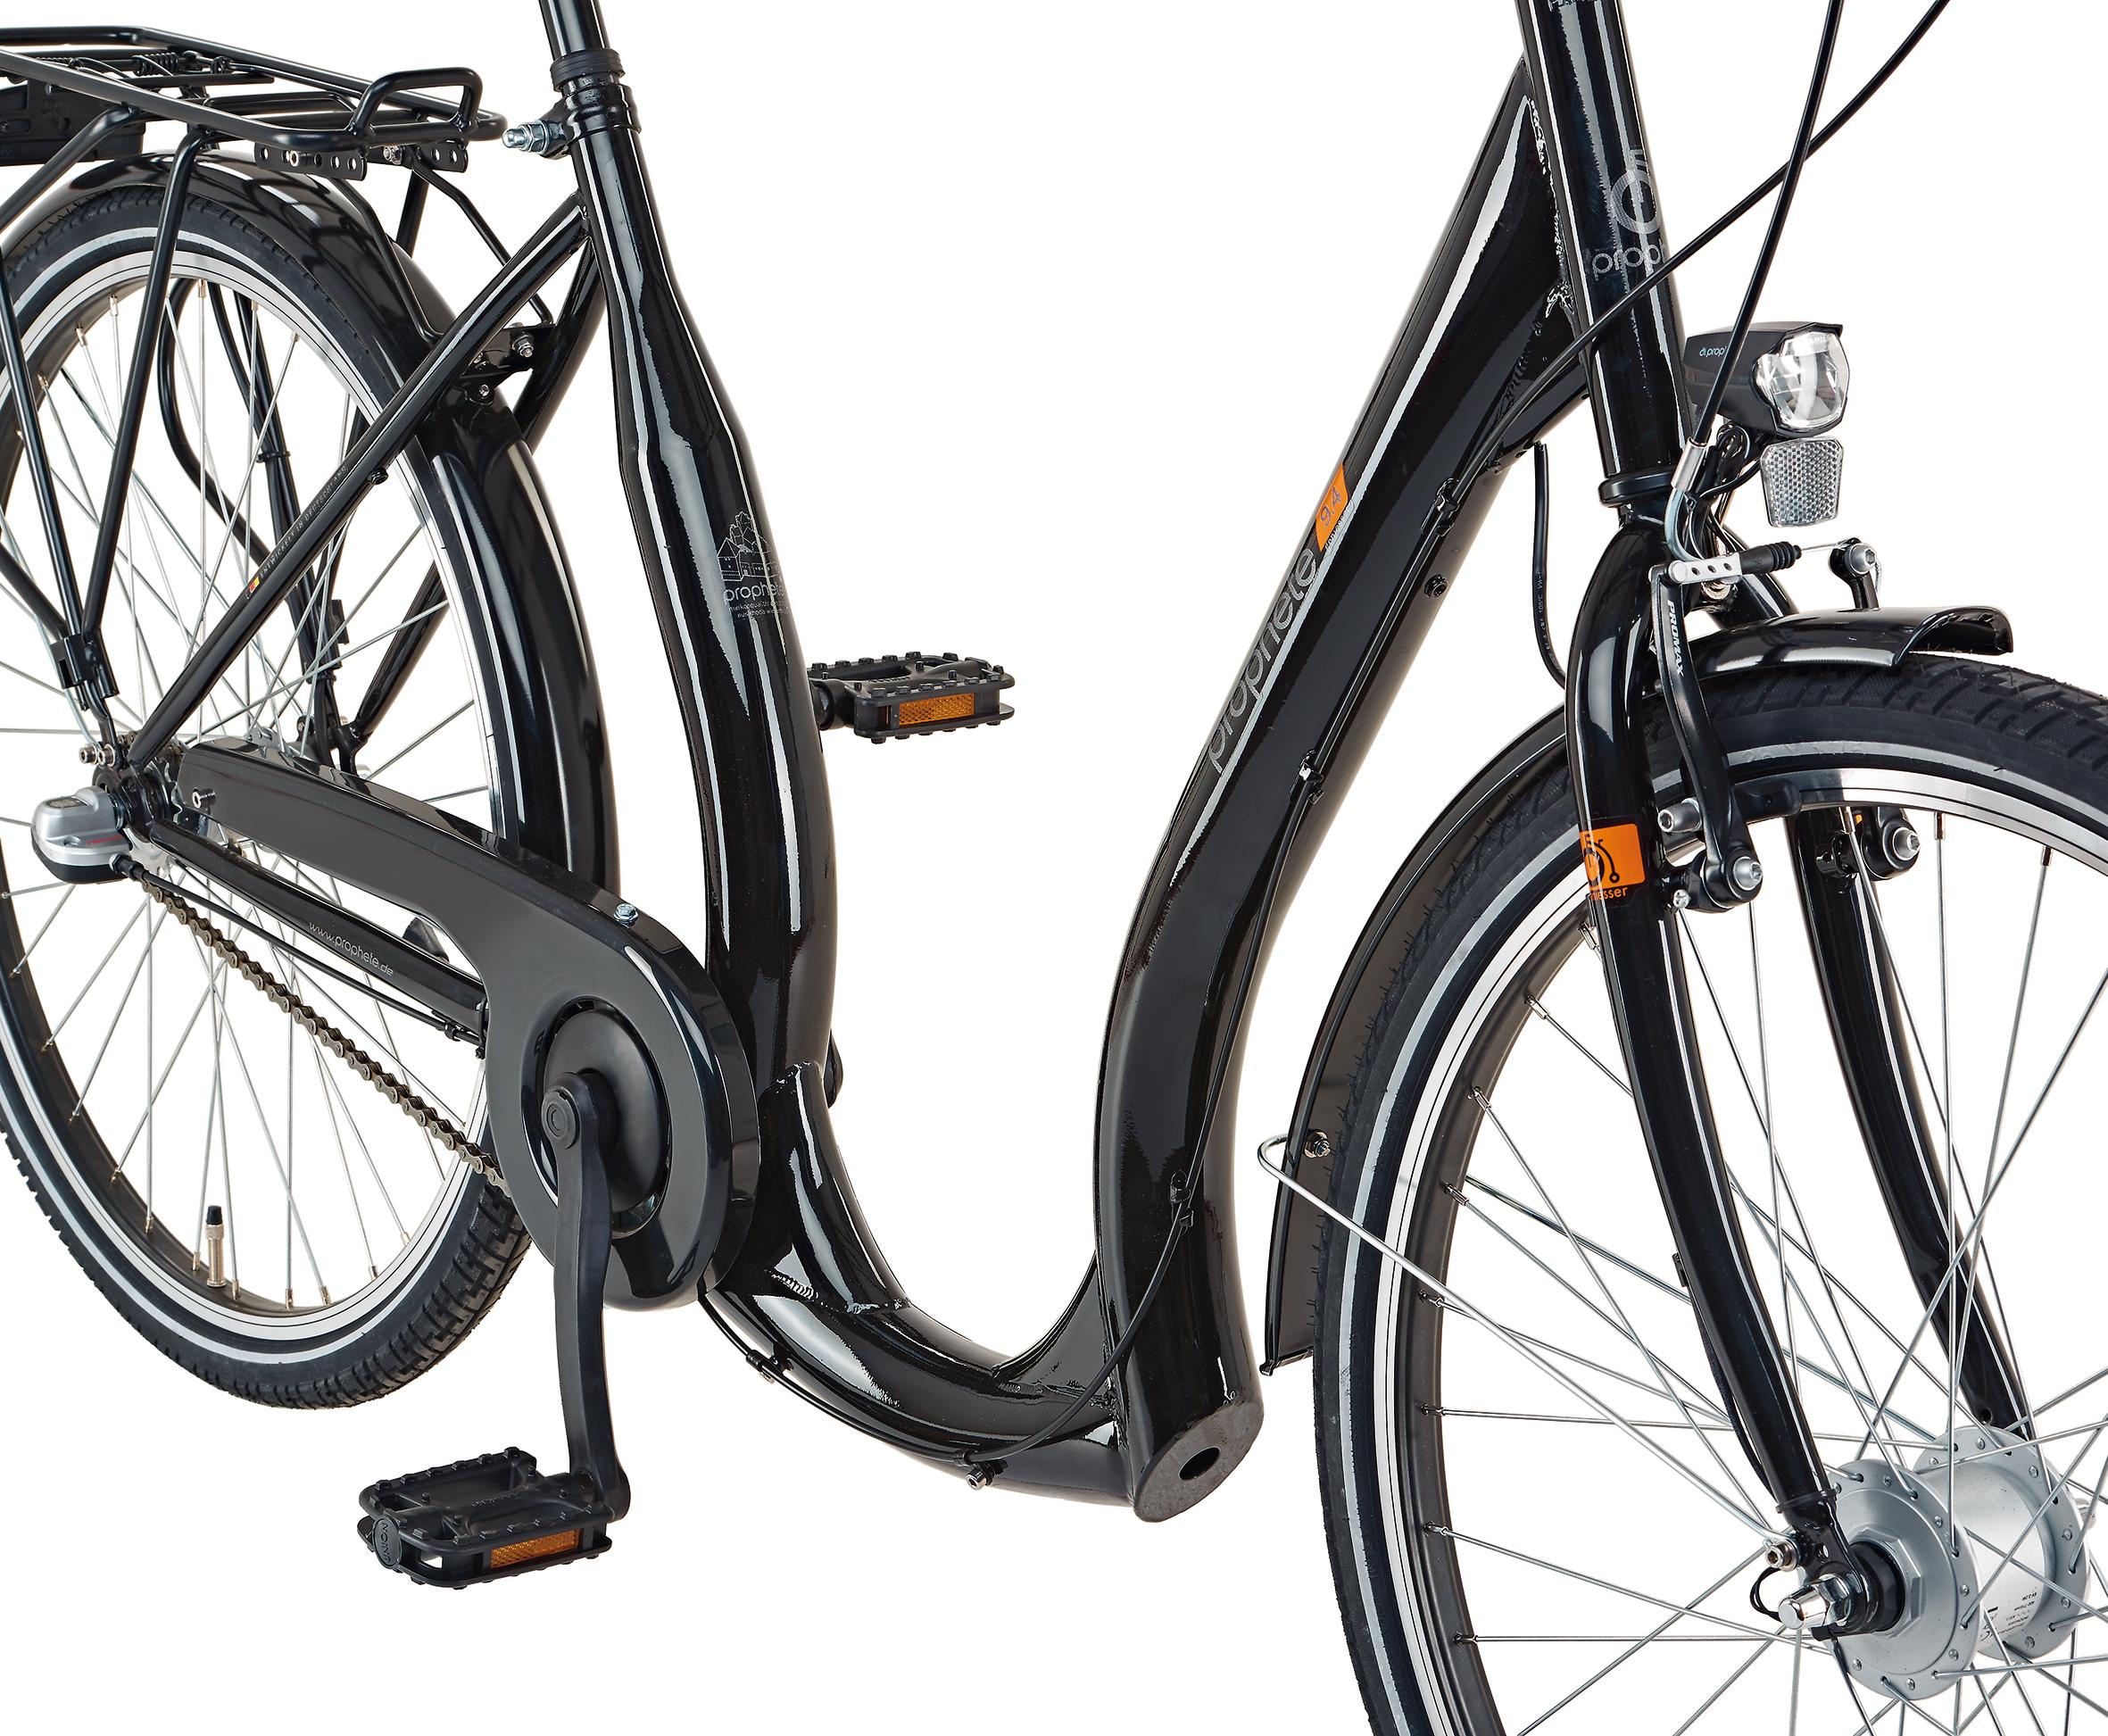 "Prophete Fahrrad / Cityrad Geniesser 9.4 City Bike 26"" Tiefeinstieg Bild 5"